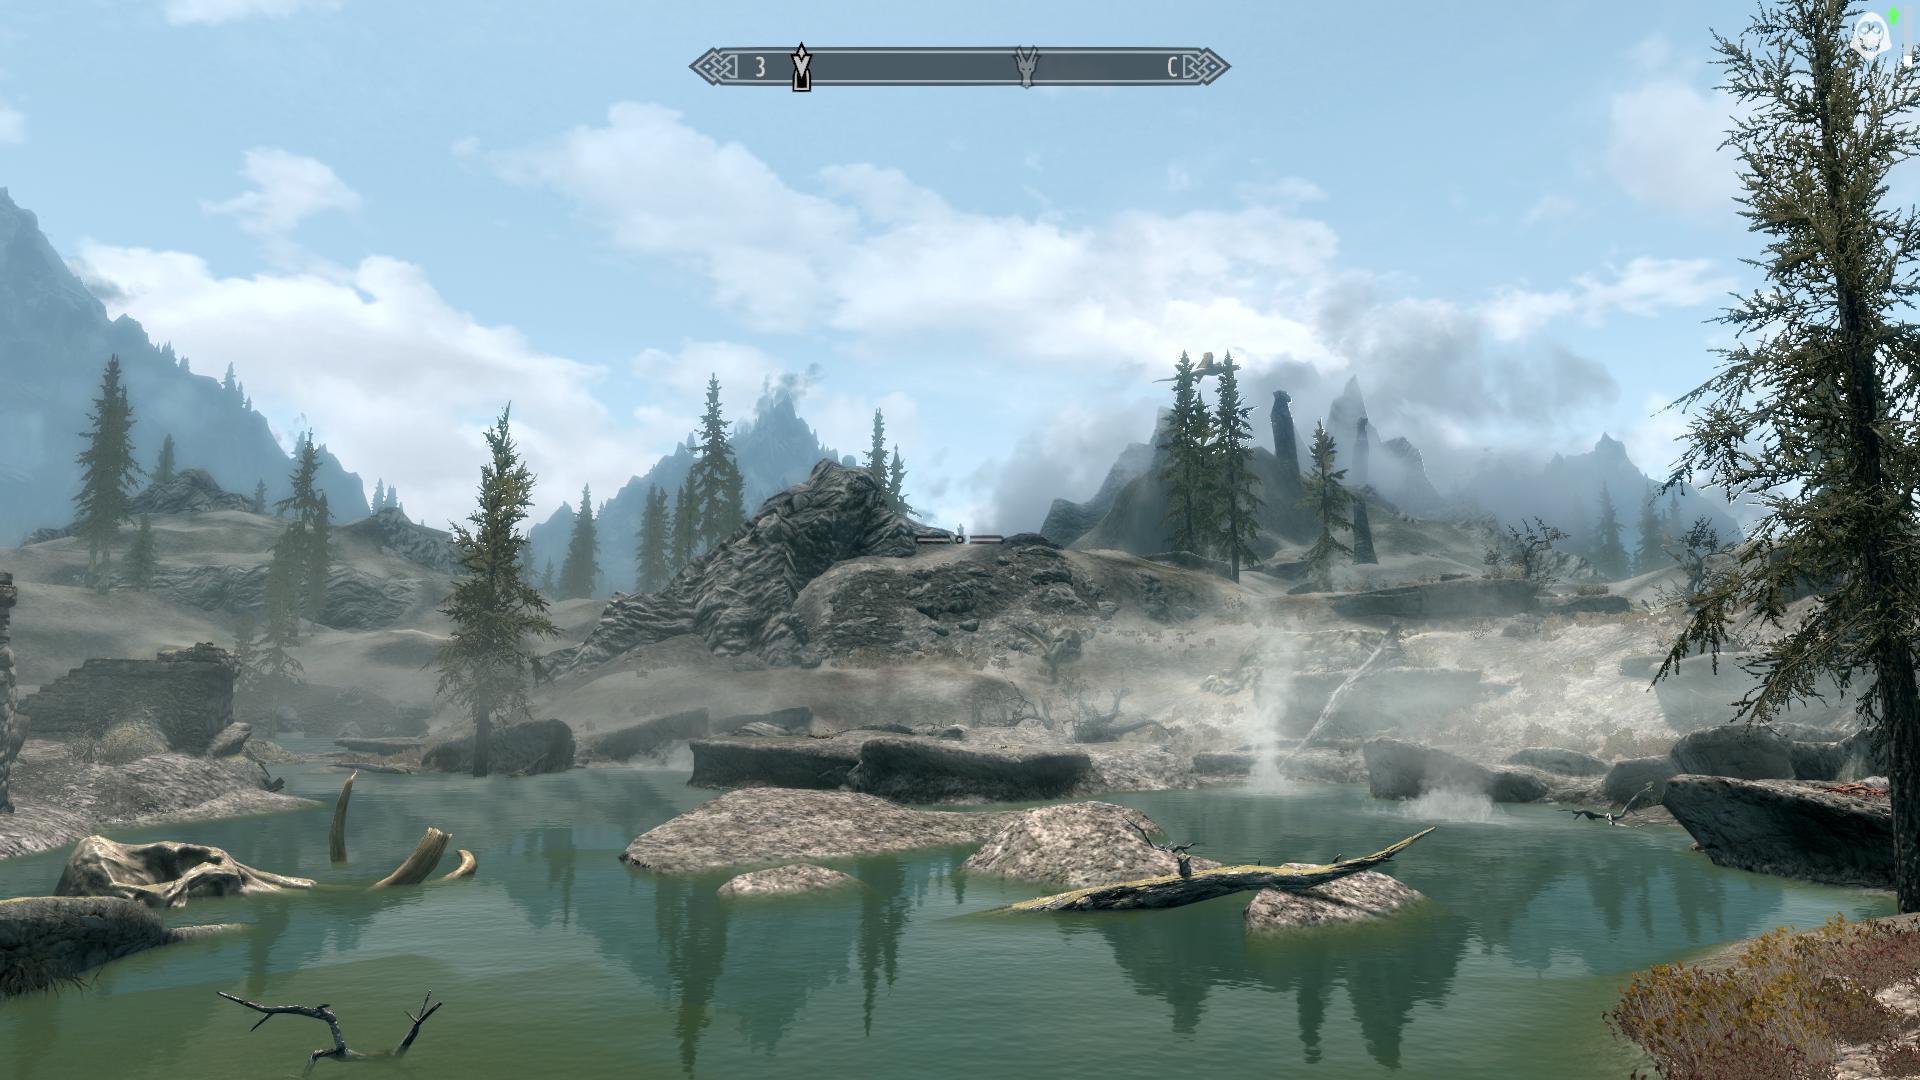 000205.Jpg - Elder Scrolls 5: Skyrim, the